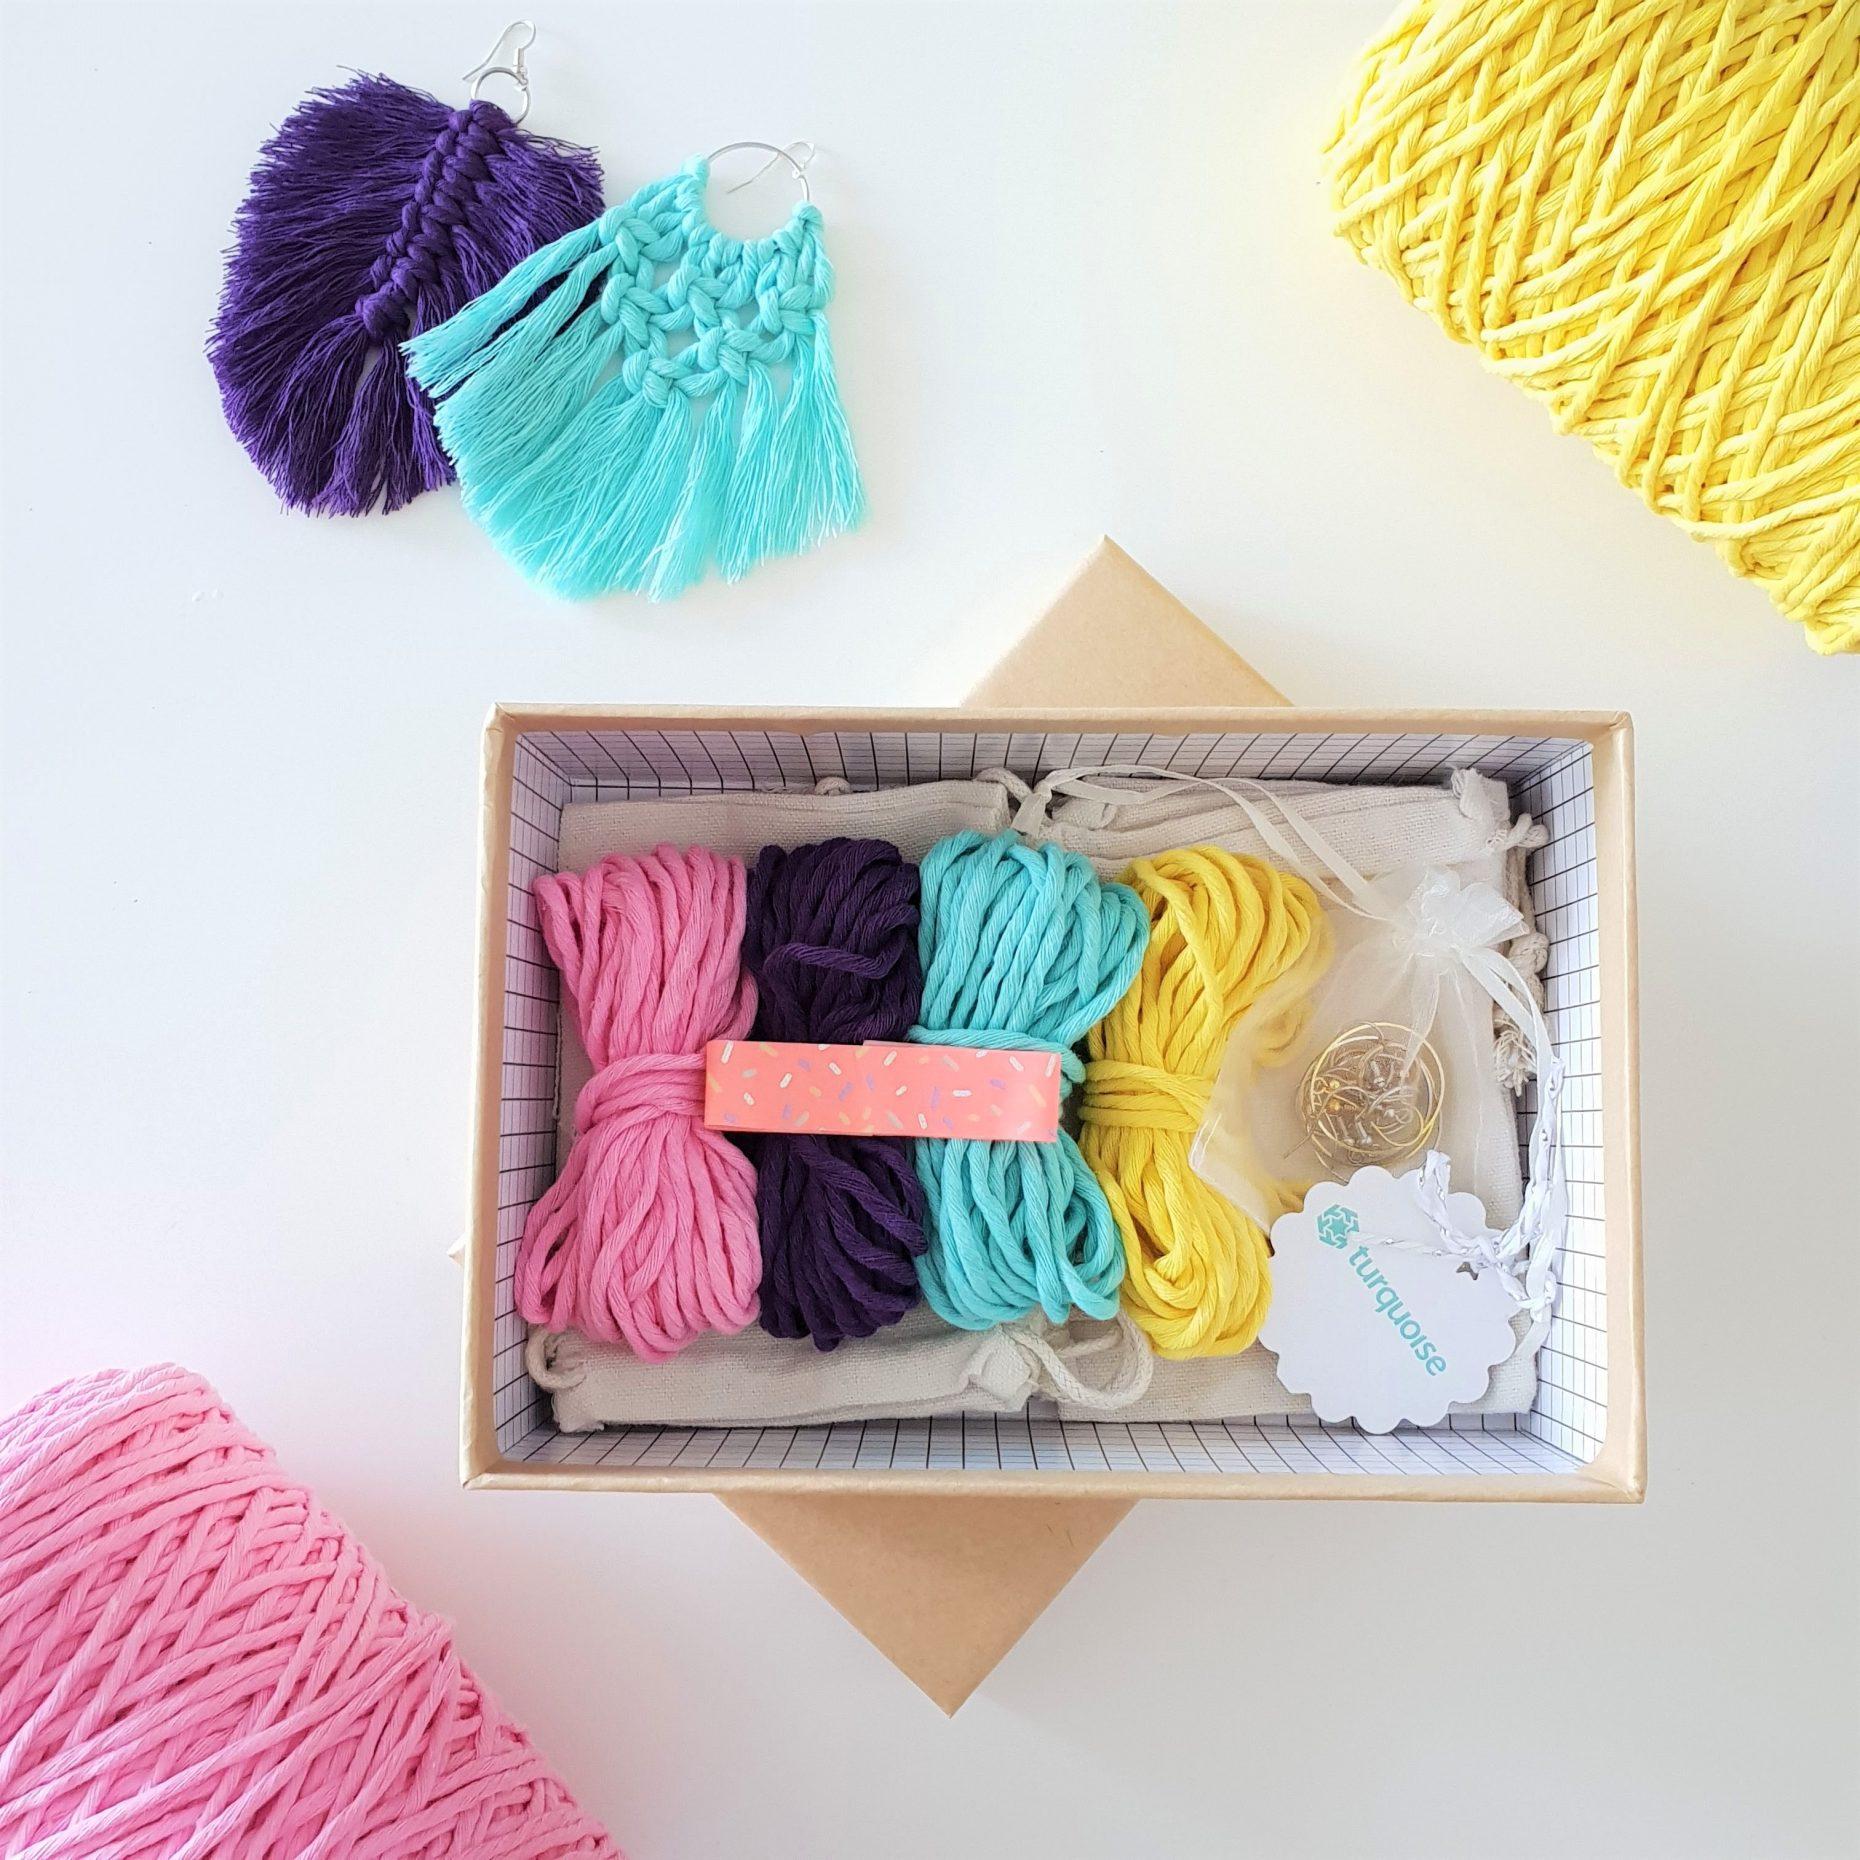 Macrame Earrings Do-It Yourself Kit DIY Macrame Craft Kit Macrame Kit Step-by-step Learn to Macrame How to Macrame